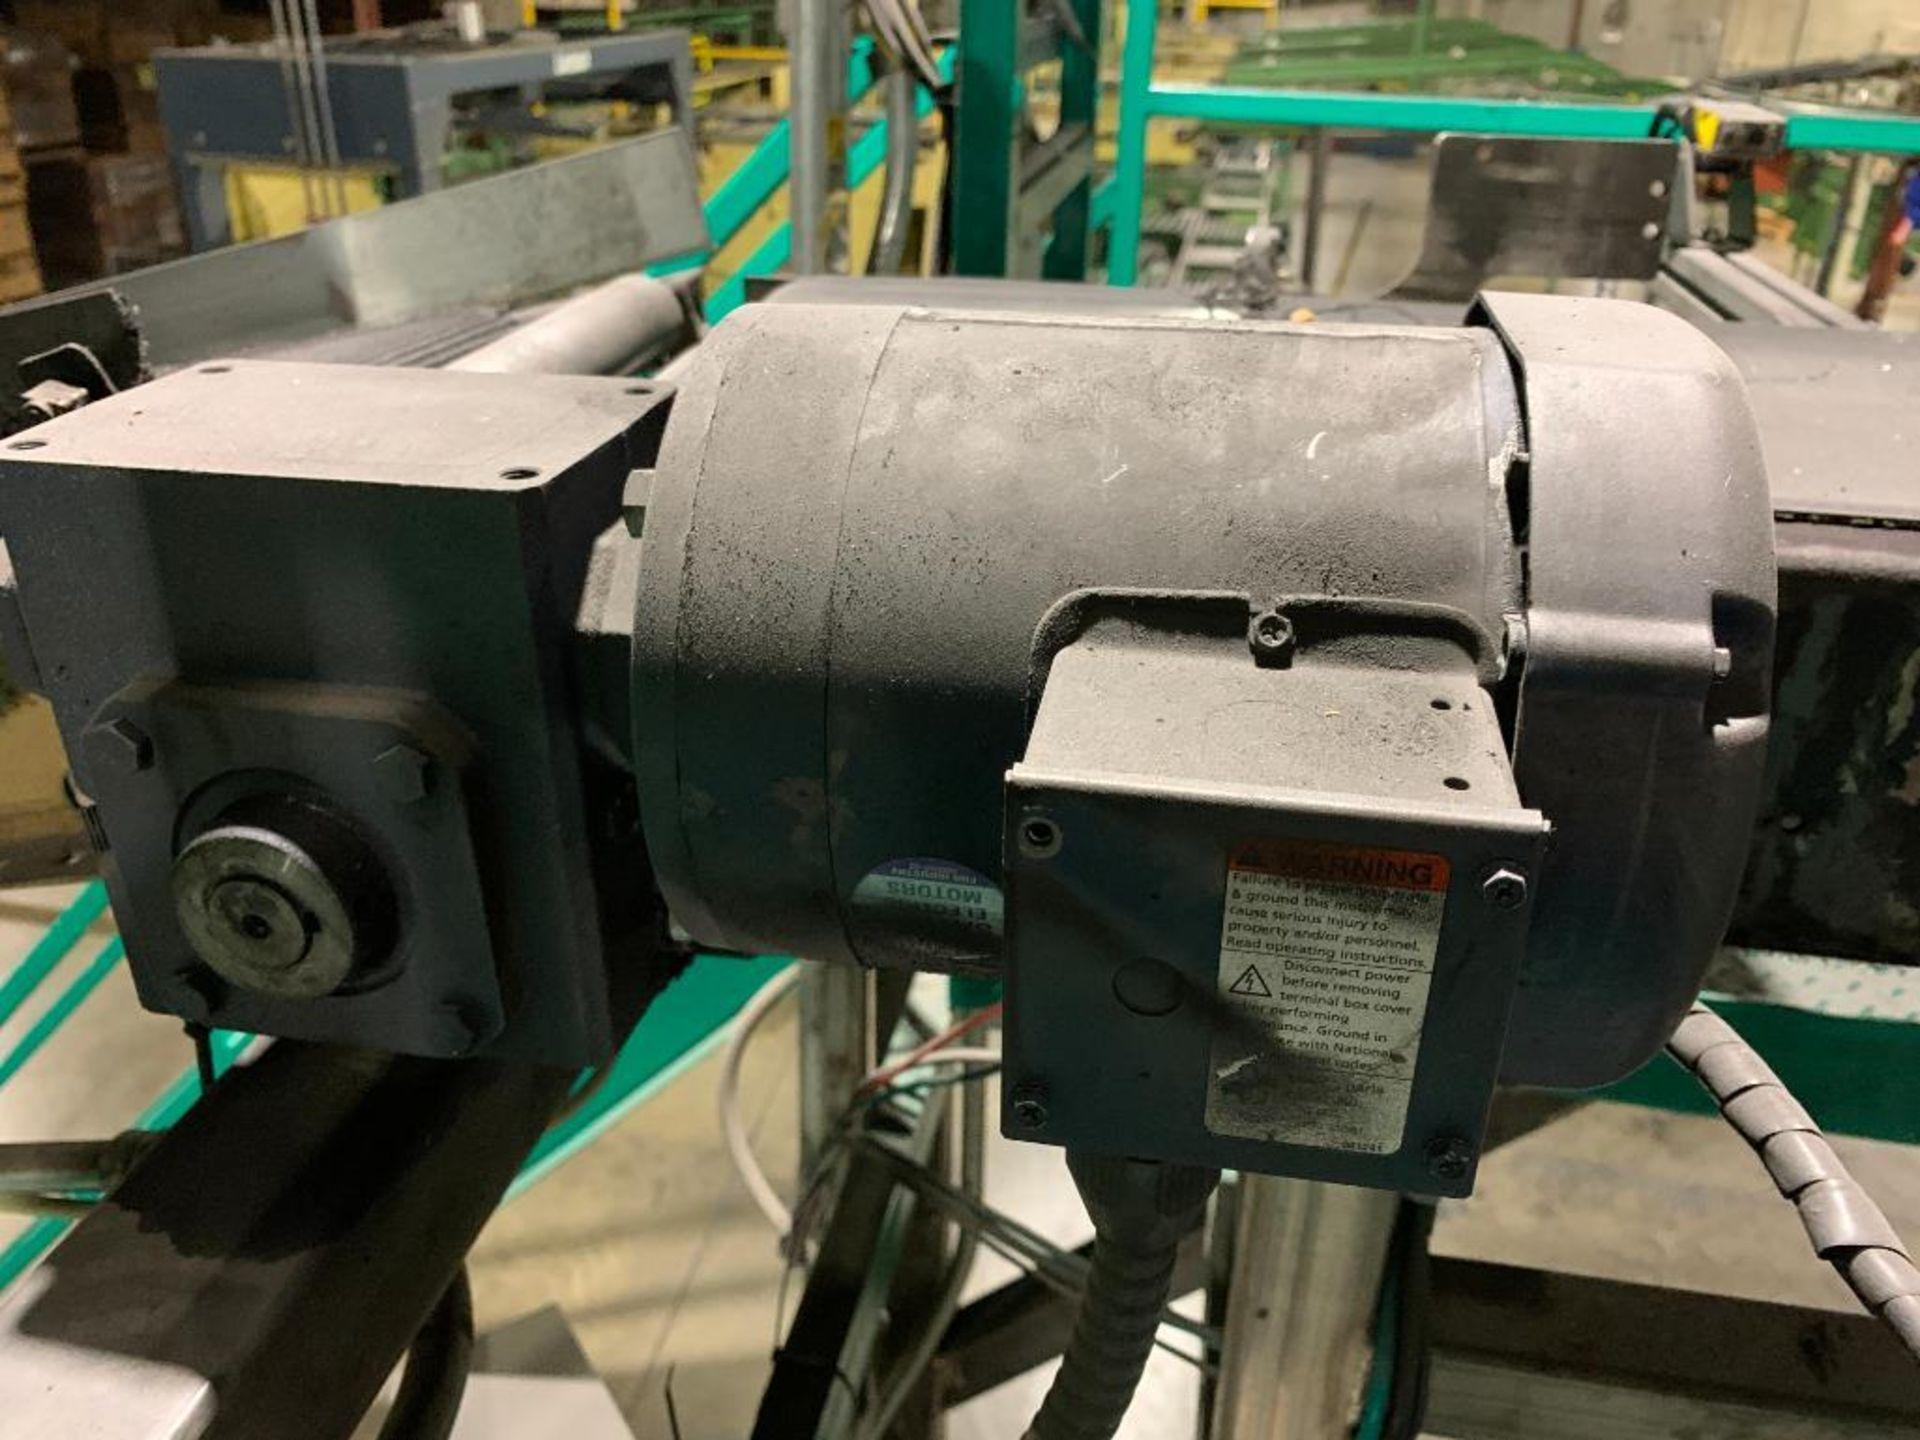 BMI stainless steel conveyor - Image 3 of 14